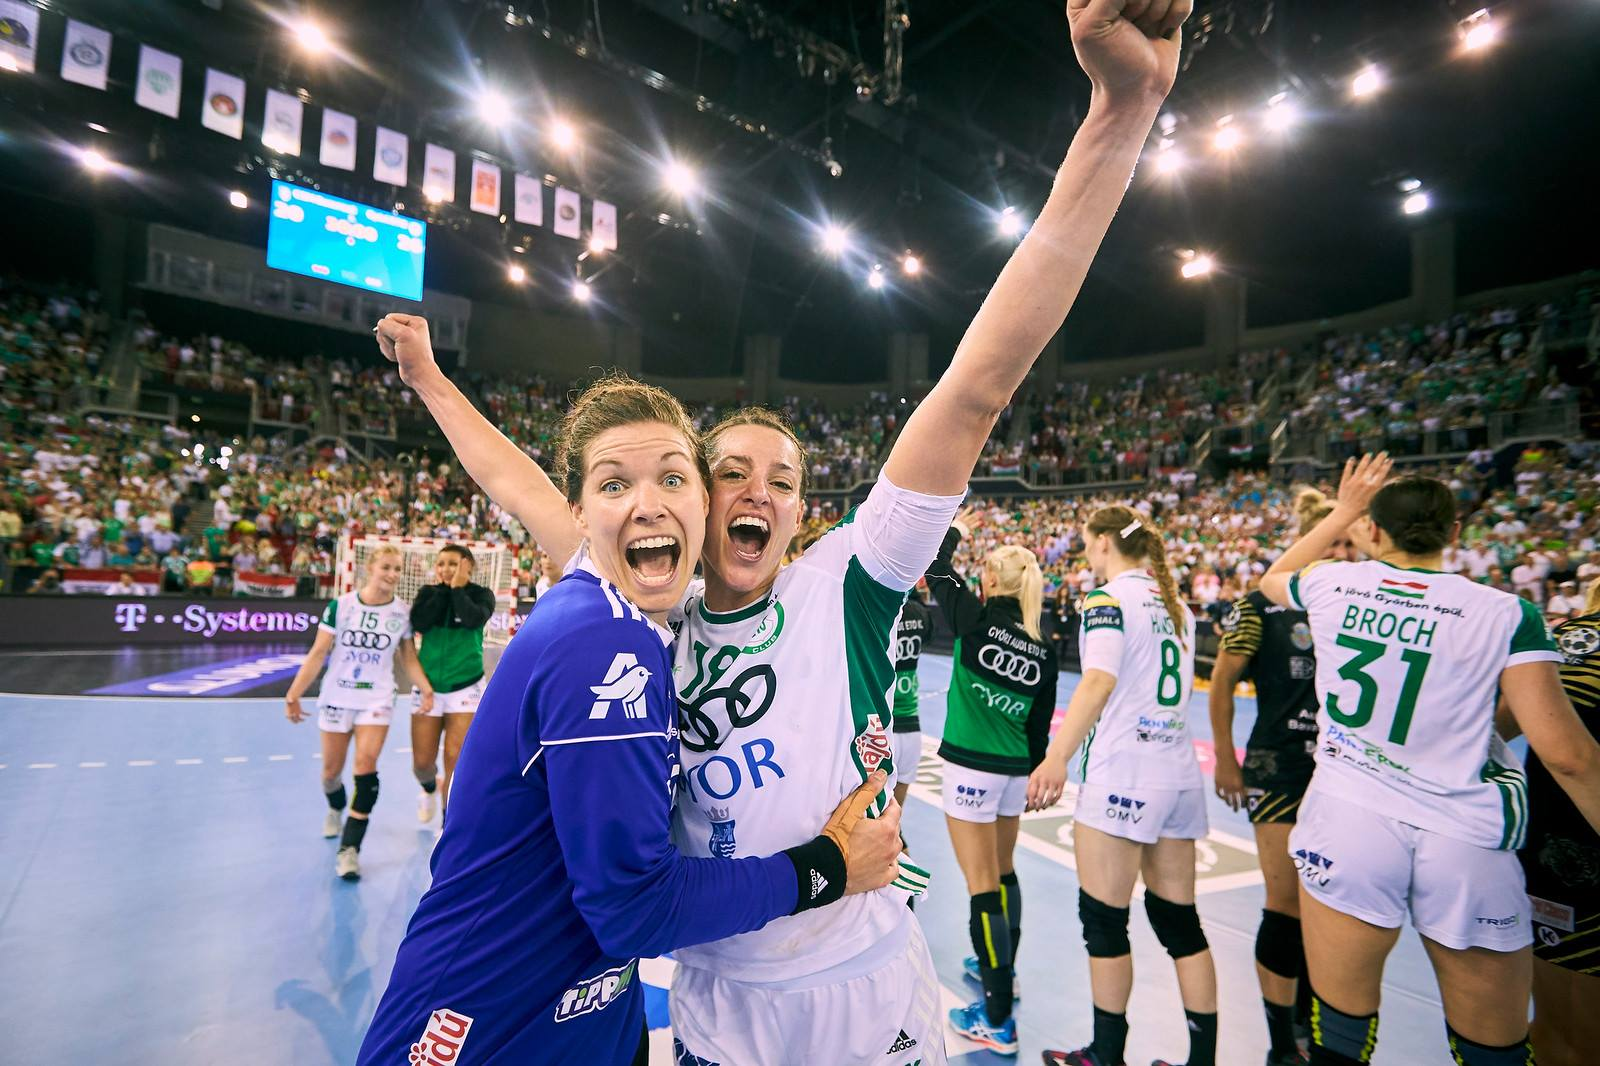 Győri öröm / Fotó: EHF/Facebook